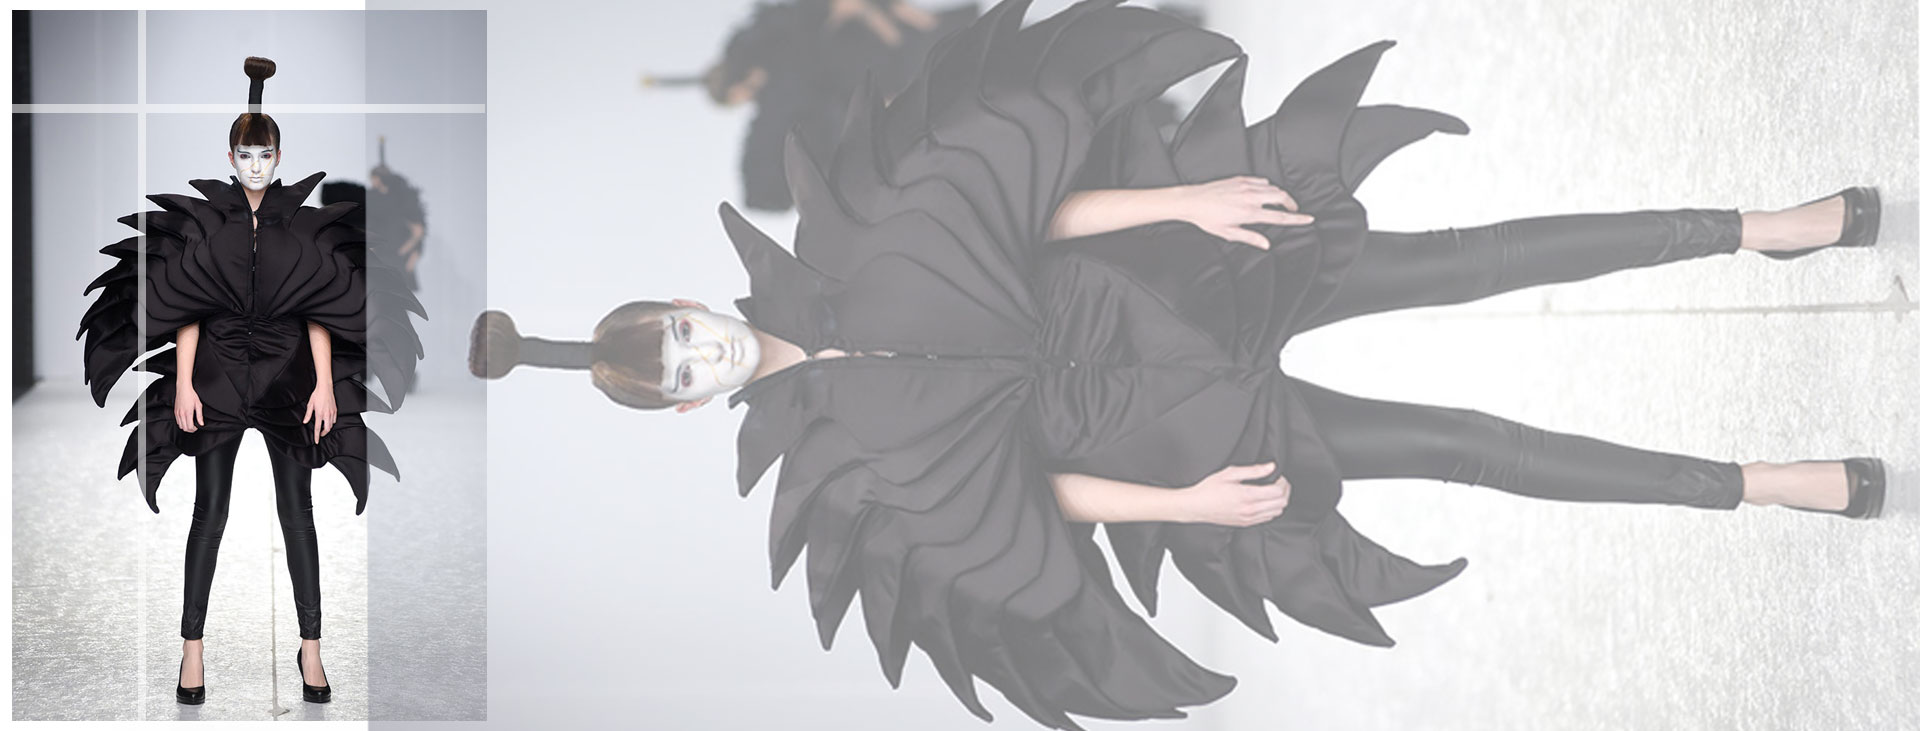 avant garde  women 12 - استایل آوانگارد زنانه